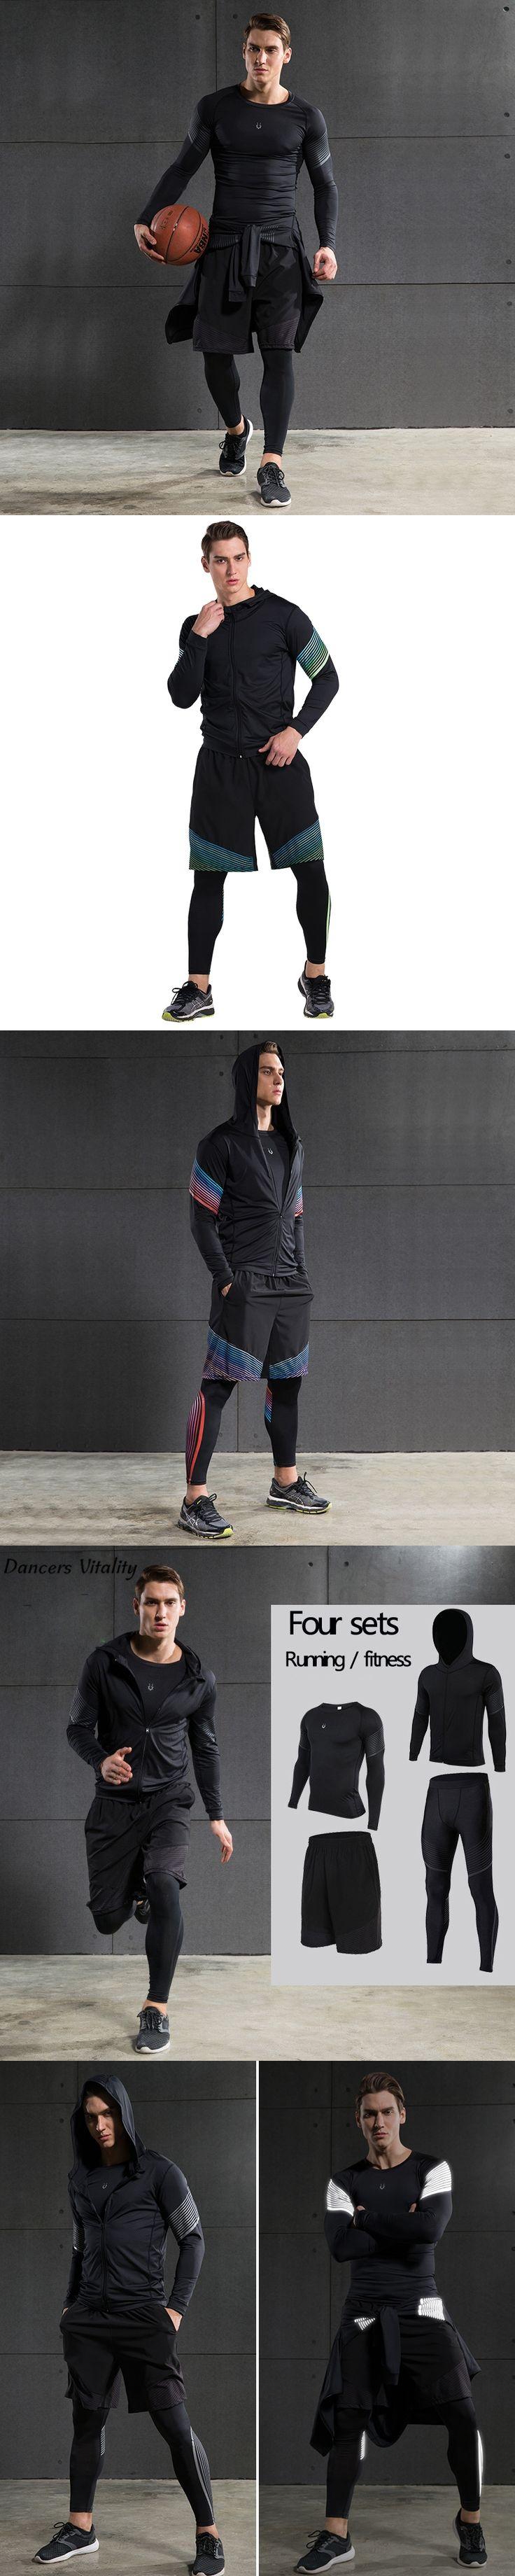 2017Men's Tights Three or four sets of gym Men's Jogging Running suit Training Long Sleeve Basketball Men's Sportswear Set